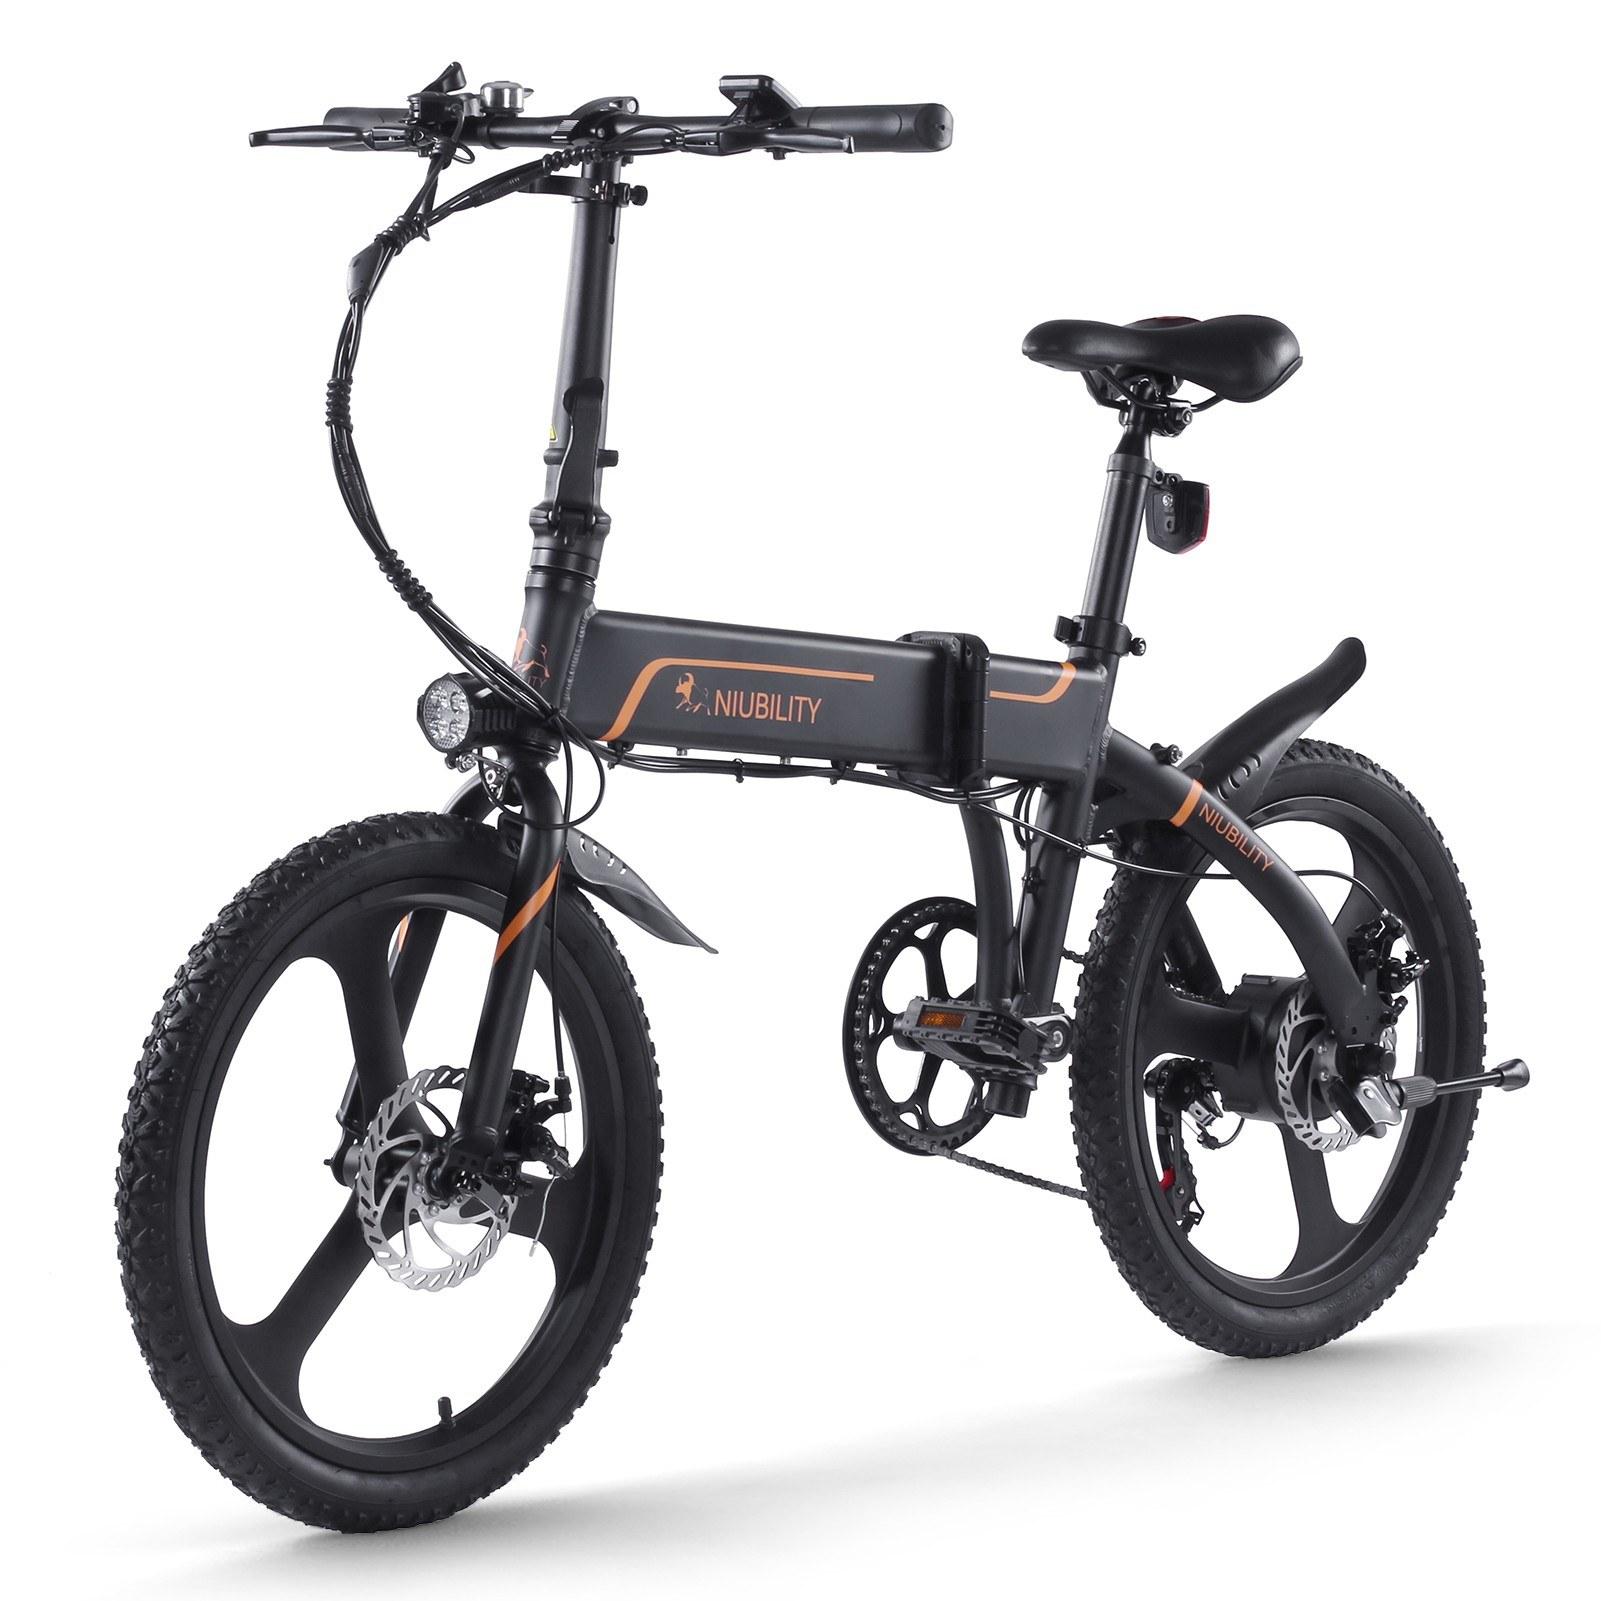 cafago.com - 32% OFF Niubility B20 20 Inch Folding Electric Bicycle 350W 40-50km Range,free shipping+$849.15